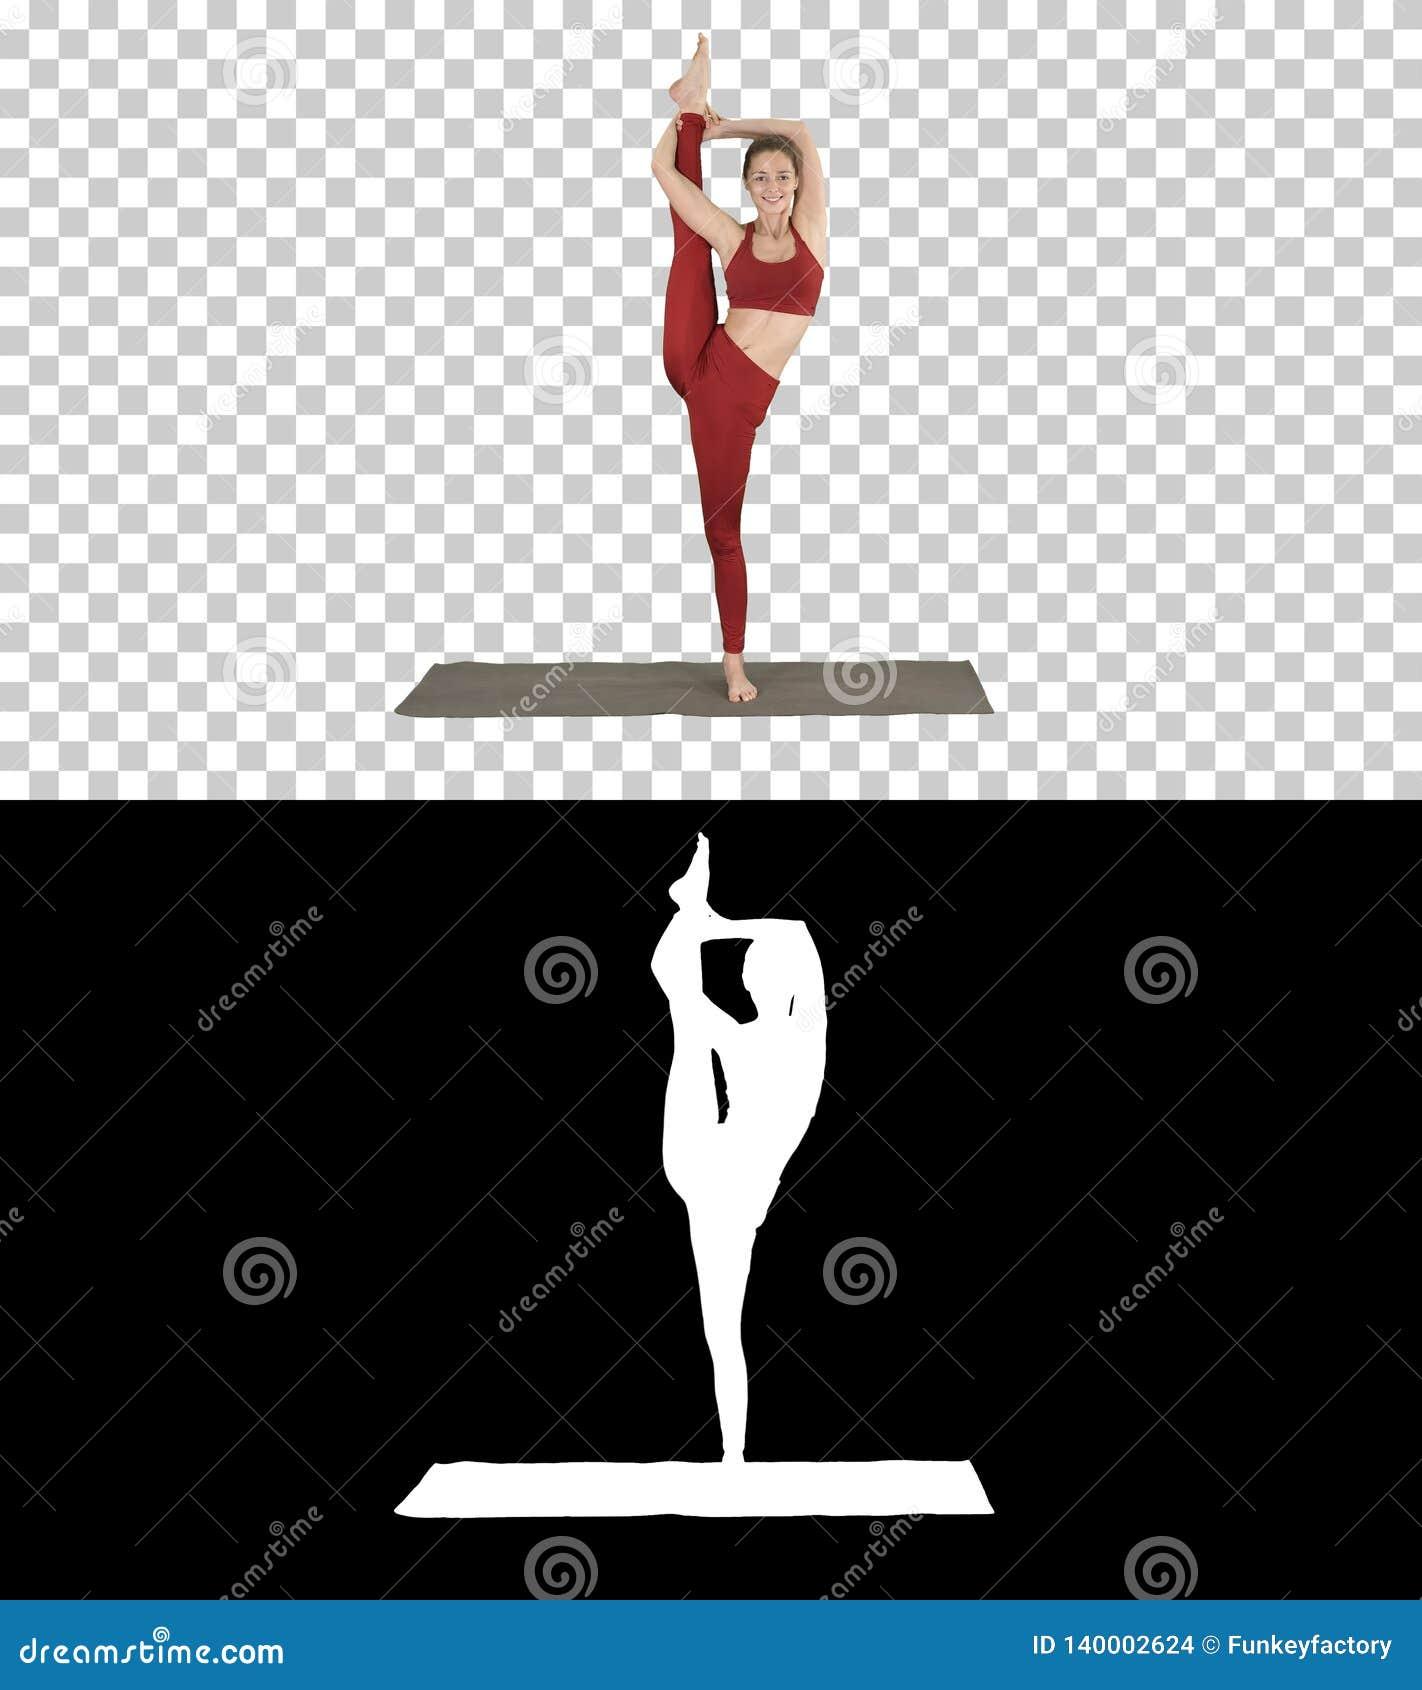 Modelo femenino Making Standing Split que sonríe, Alpha Channel de la yoga